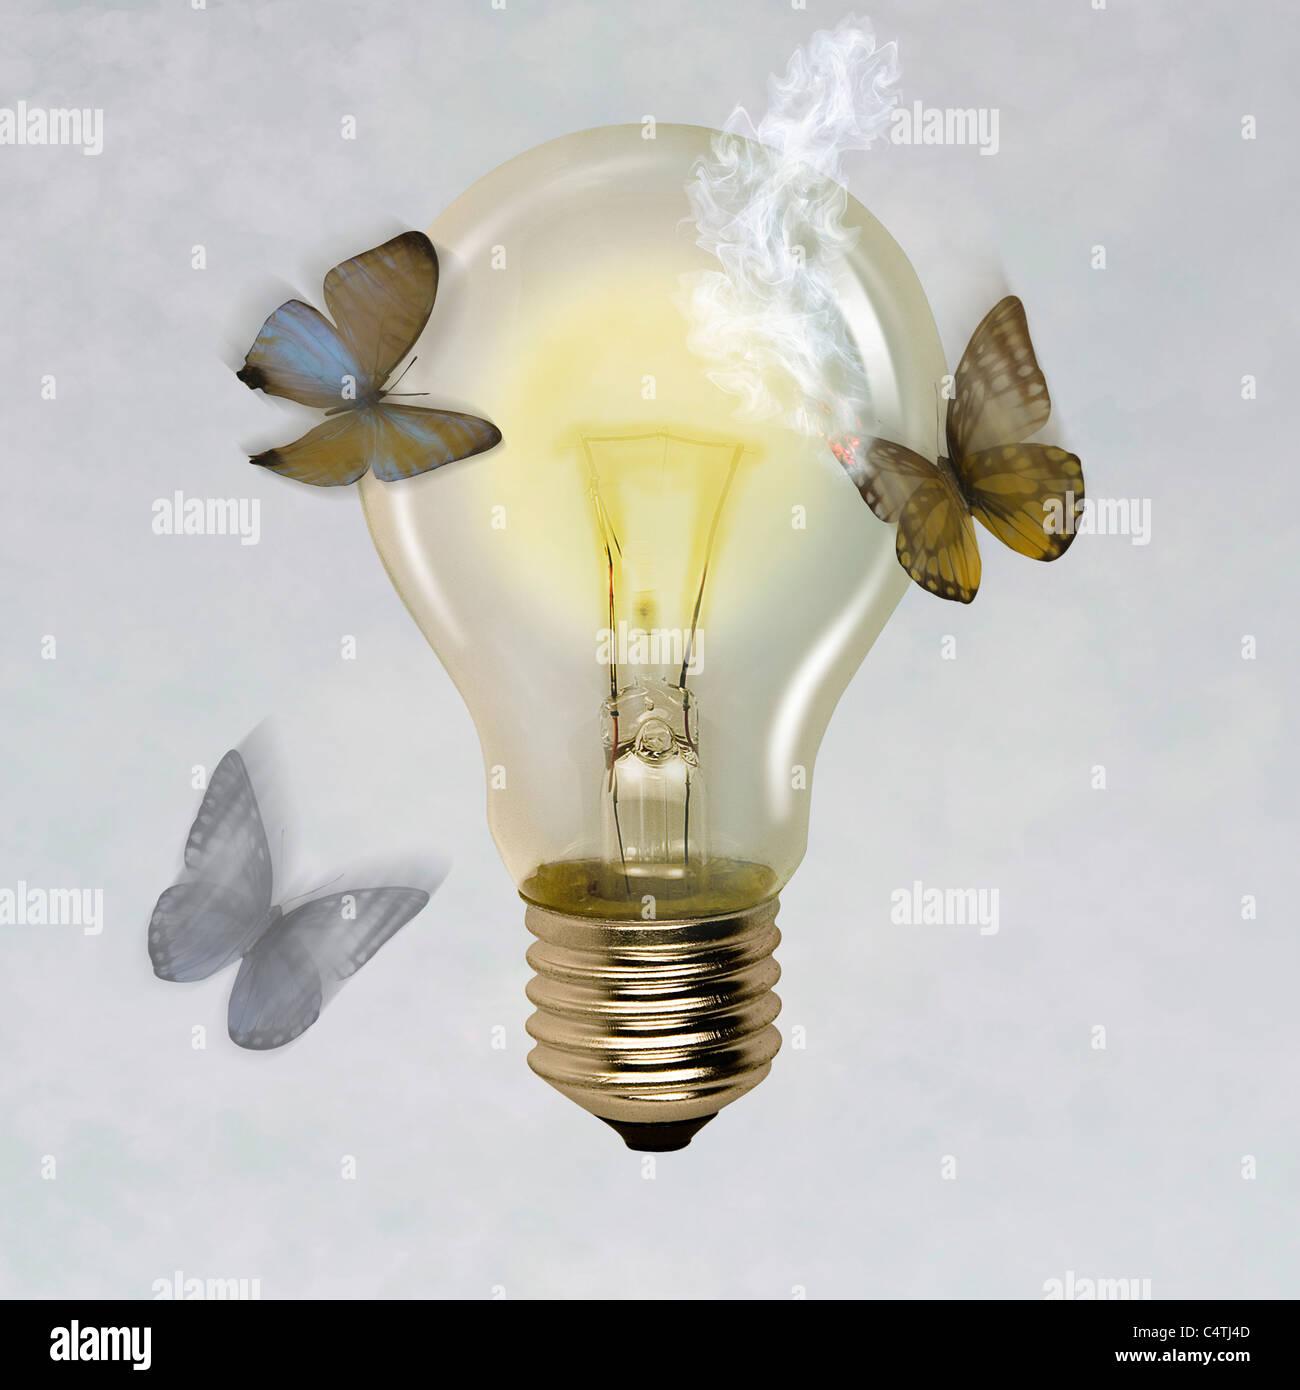 Moths flying around illuminated light bulb, one moth's wing burned - Stock Image